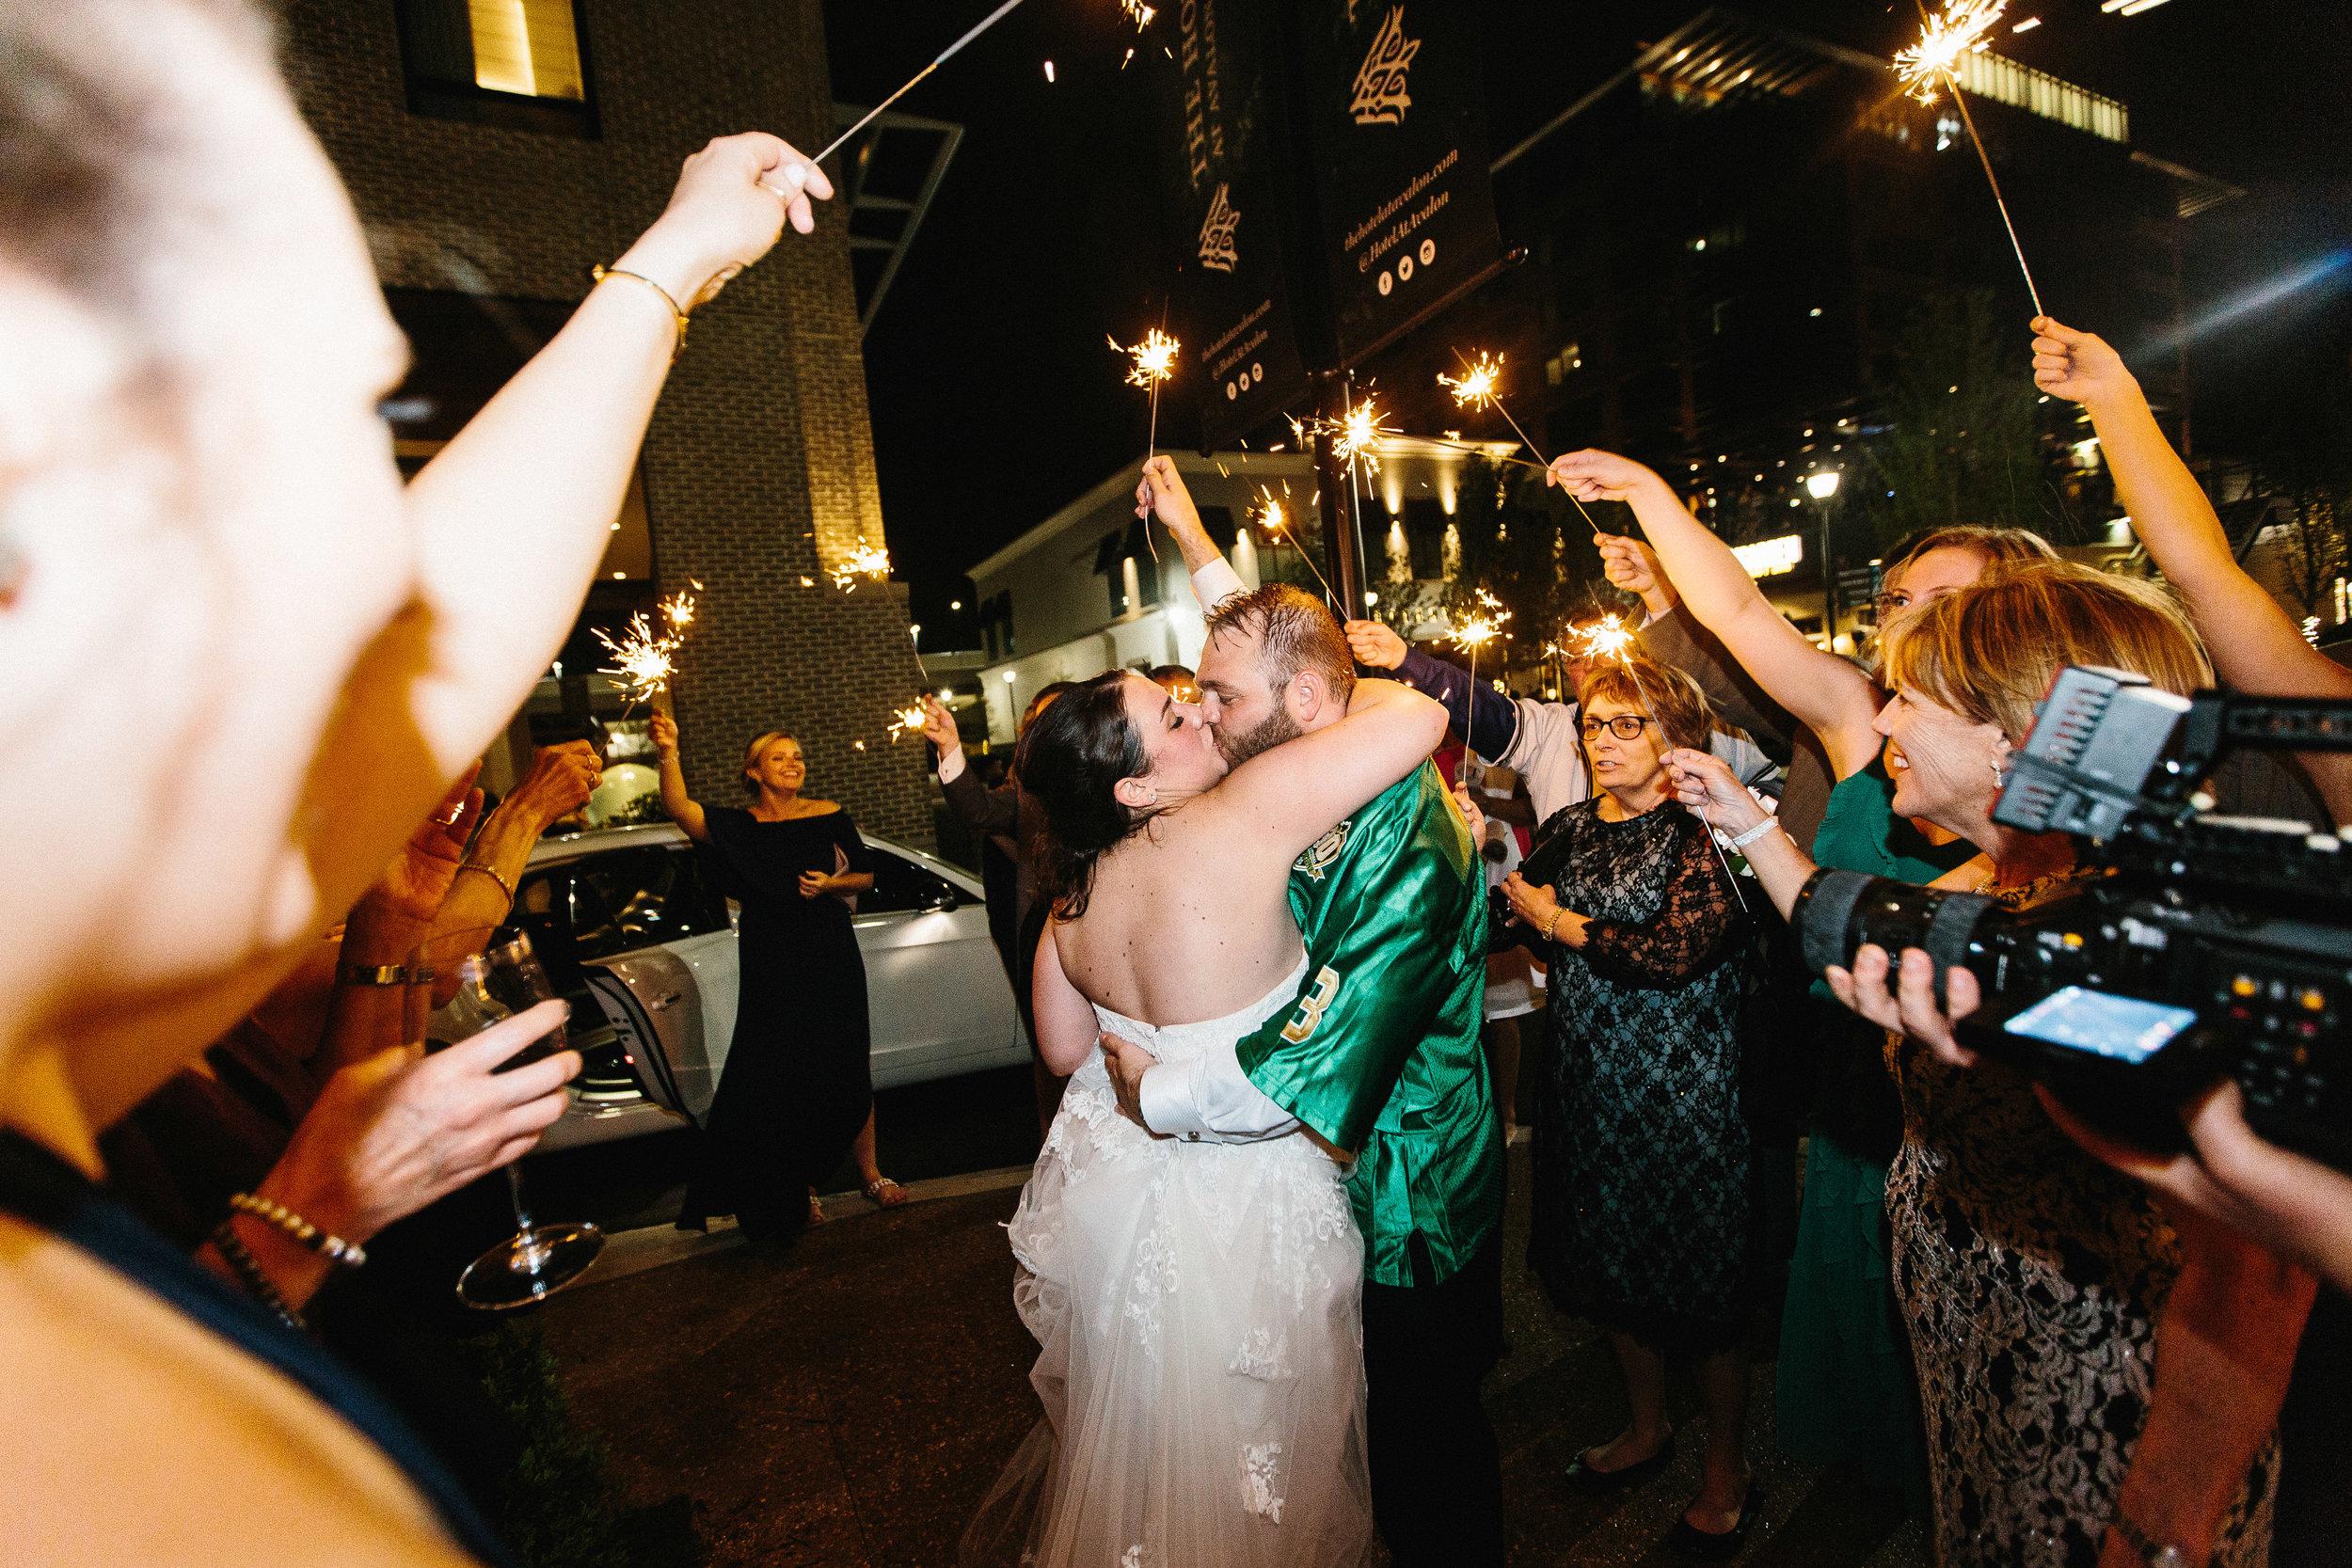 roswell_st_peter_chanel_catholic_avalon_hotel_alpharetta_wedding-2332.jpg